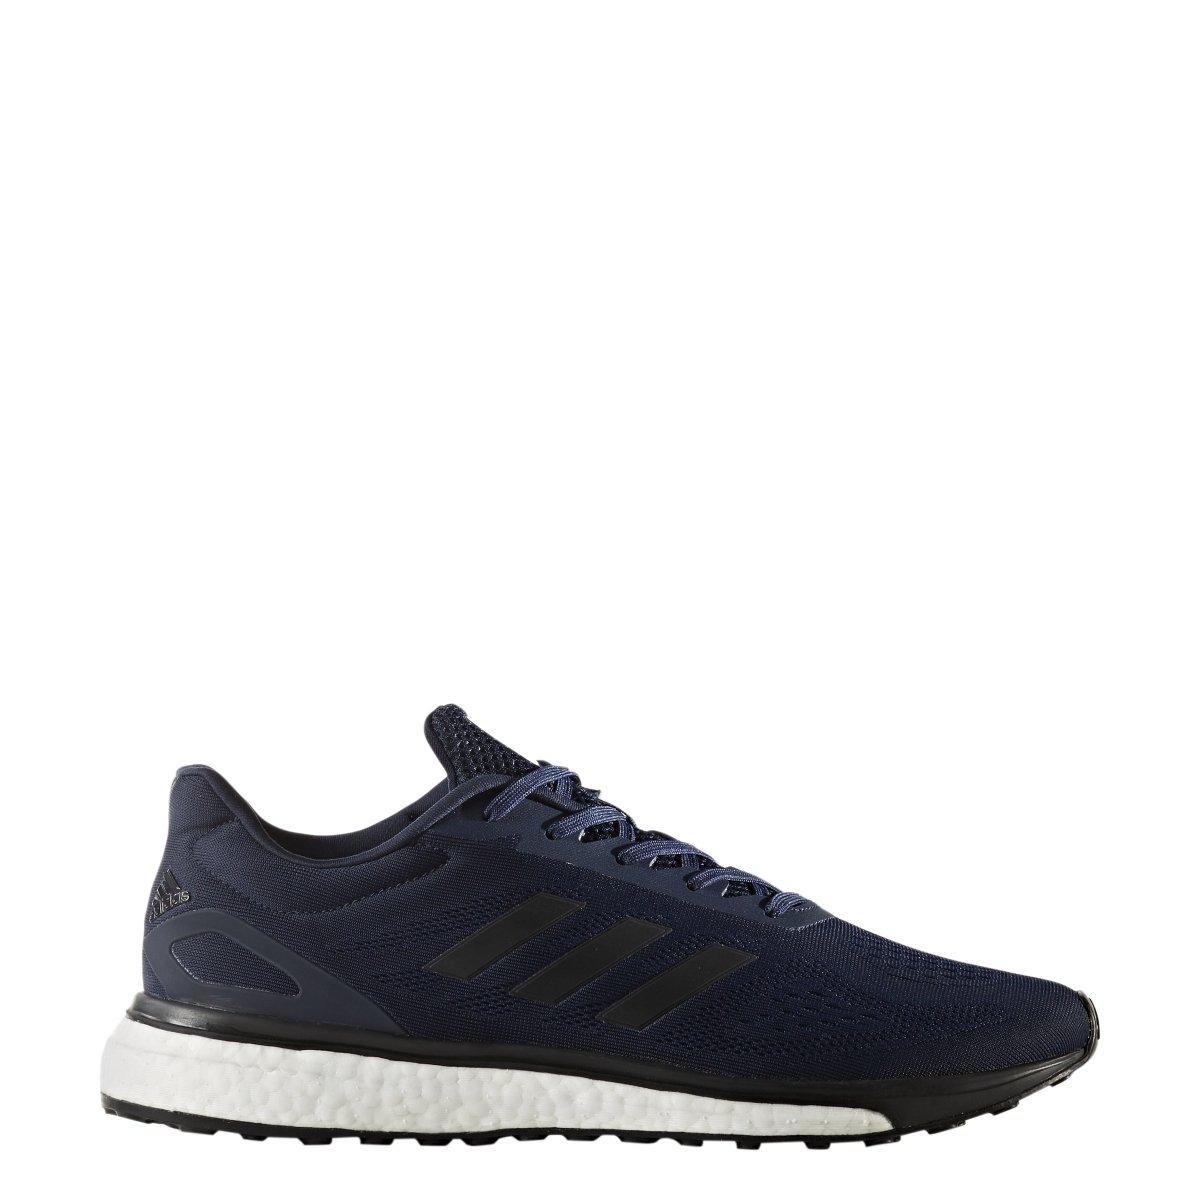 122da94f0081a0 Galleon - Adidas Response Boost LT Mens Running Shoe 9.5 Collegiate Navy